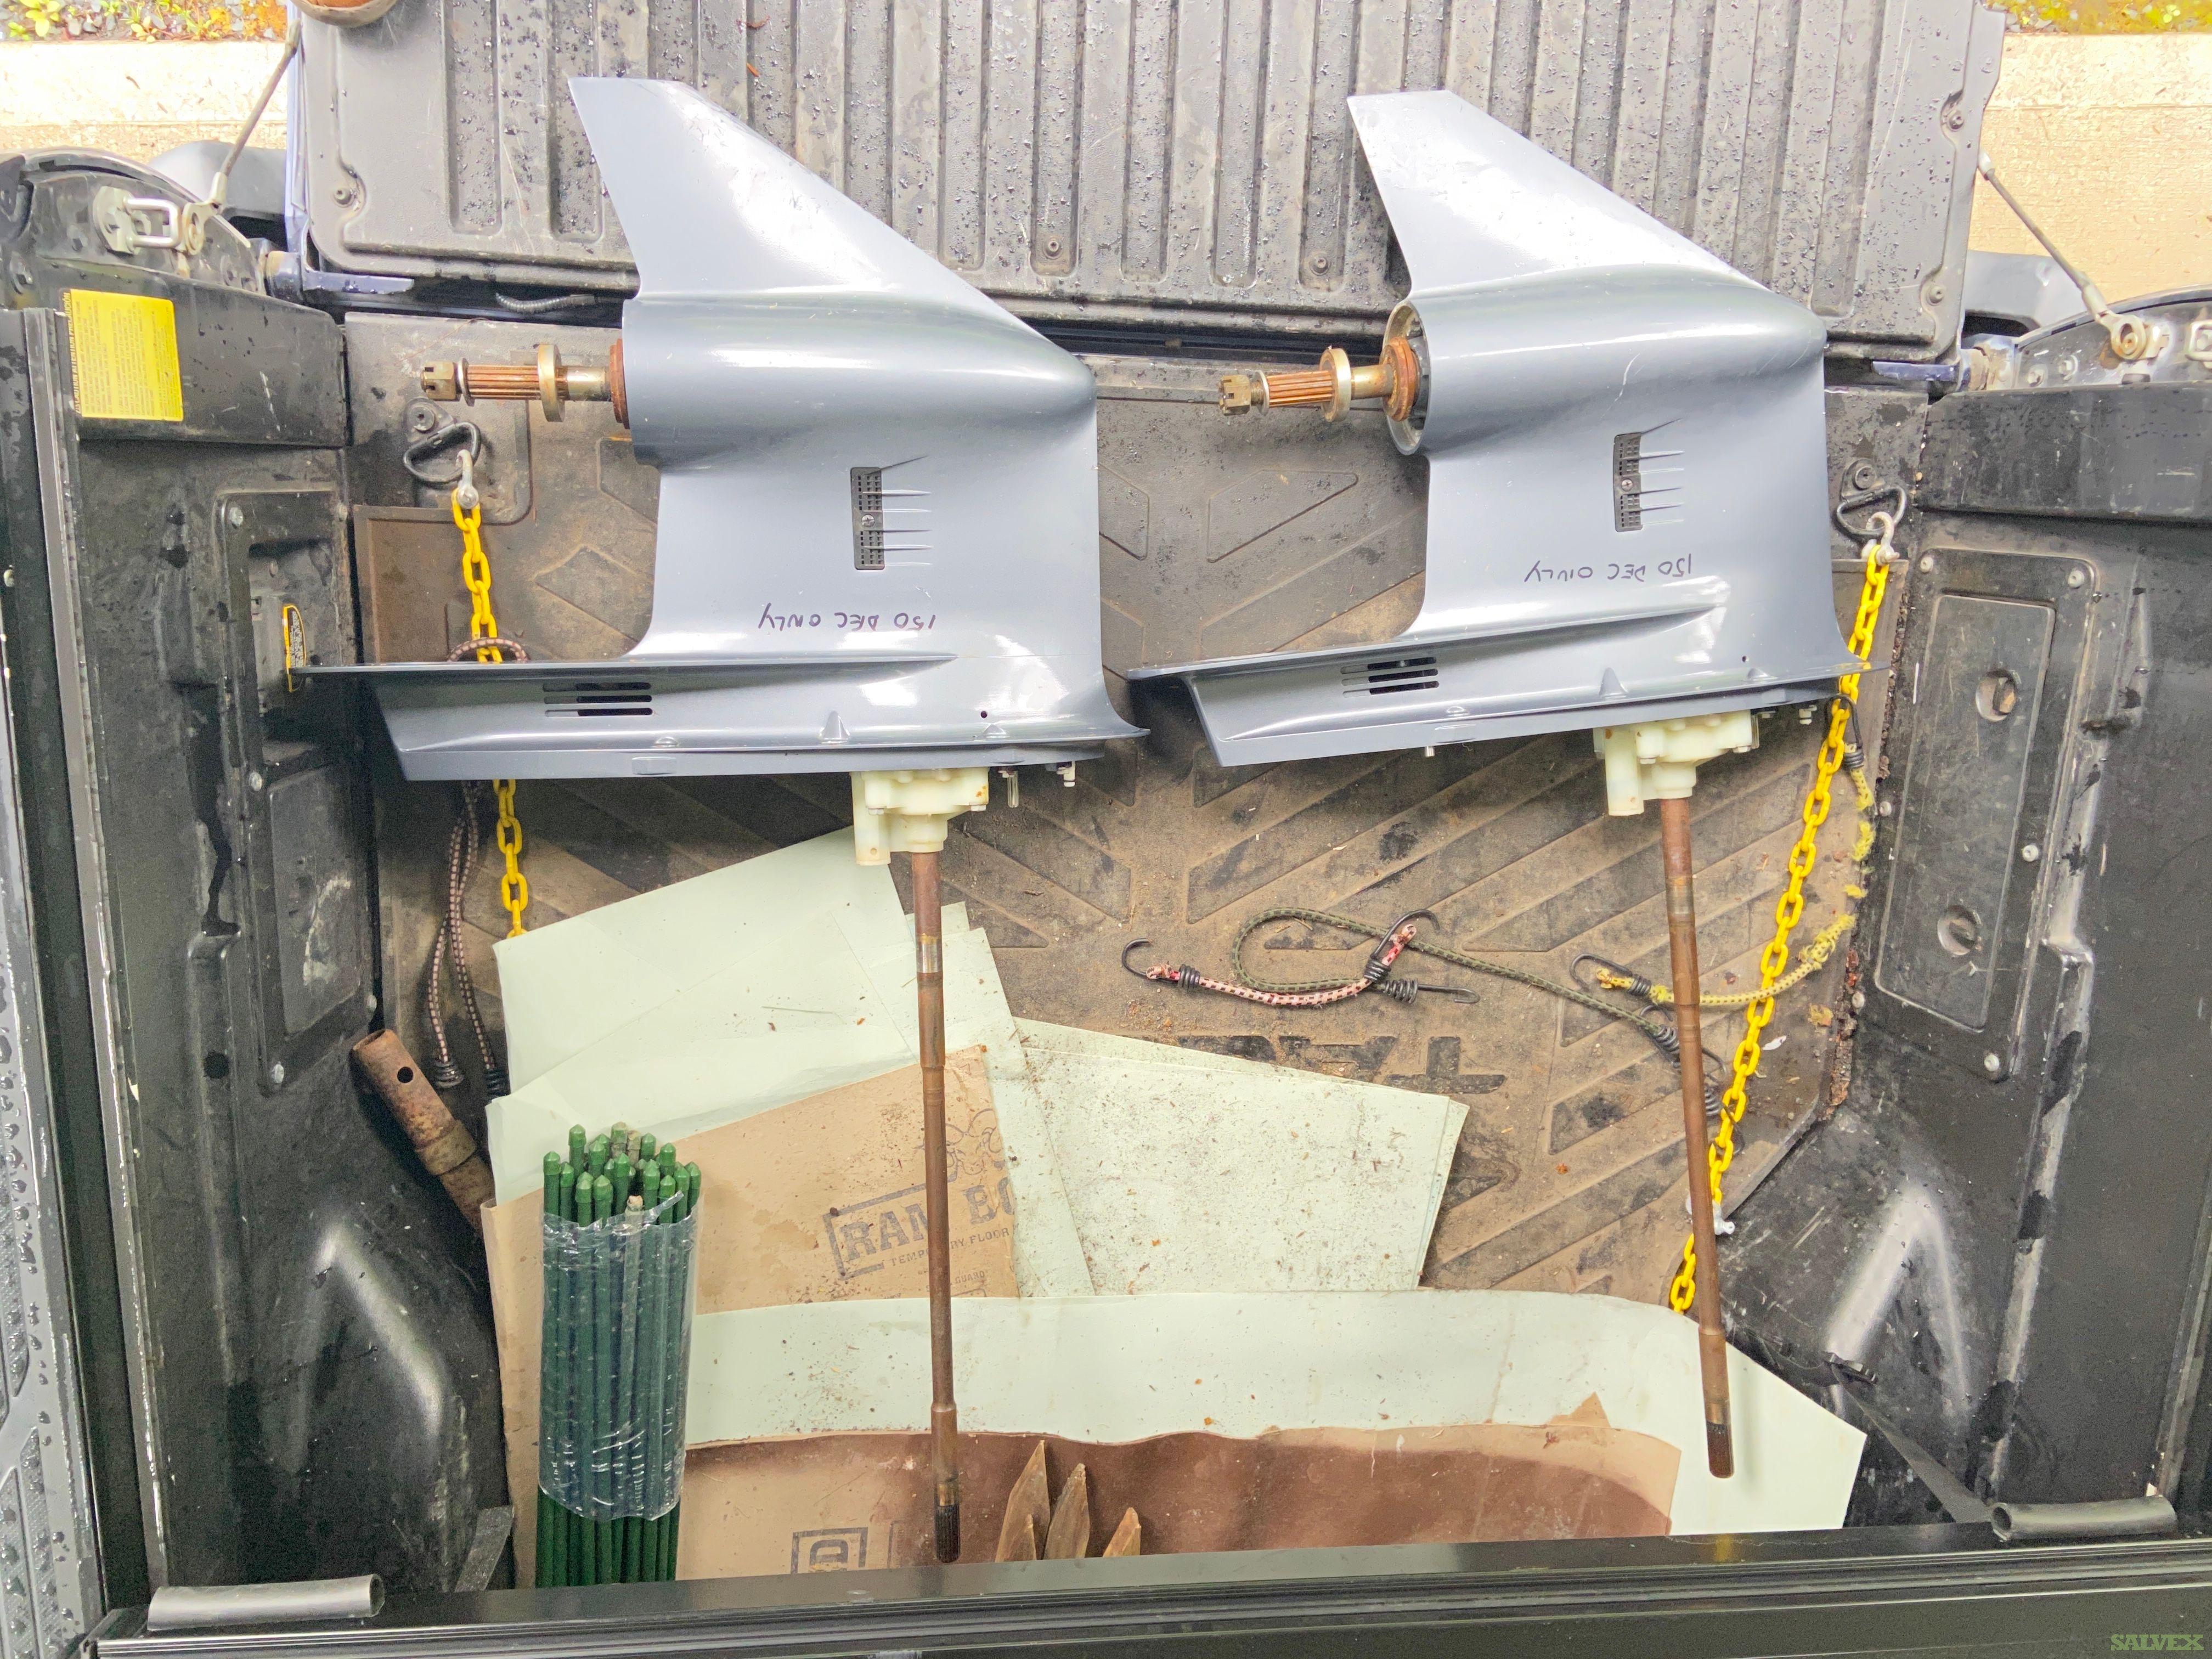 150 HP Yamaha Outboard Lower Units(2 Units) In Alaska